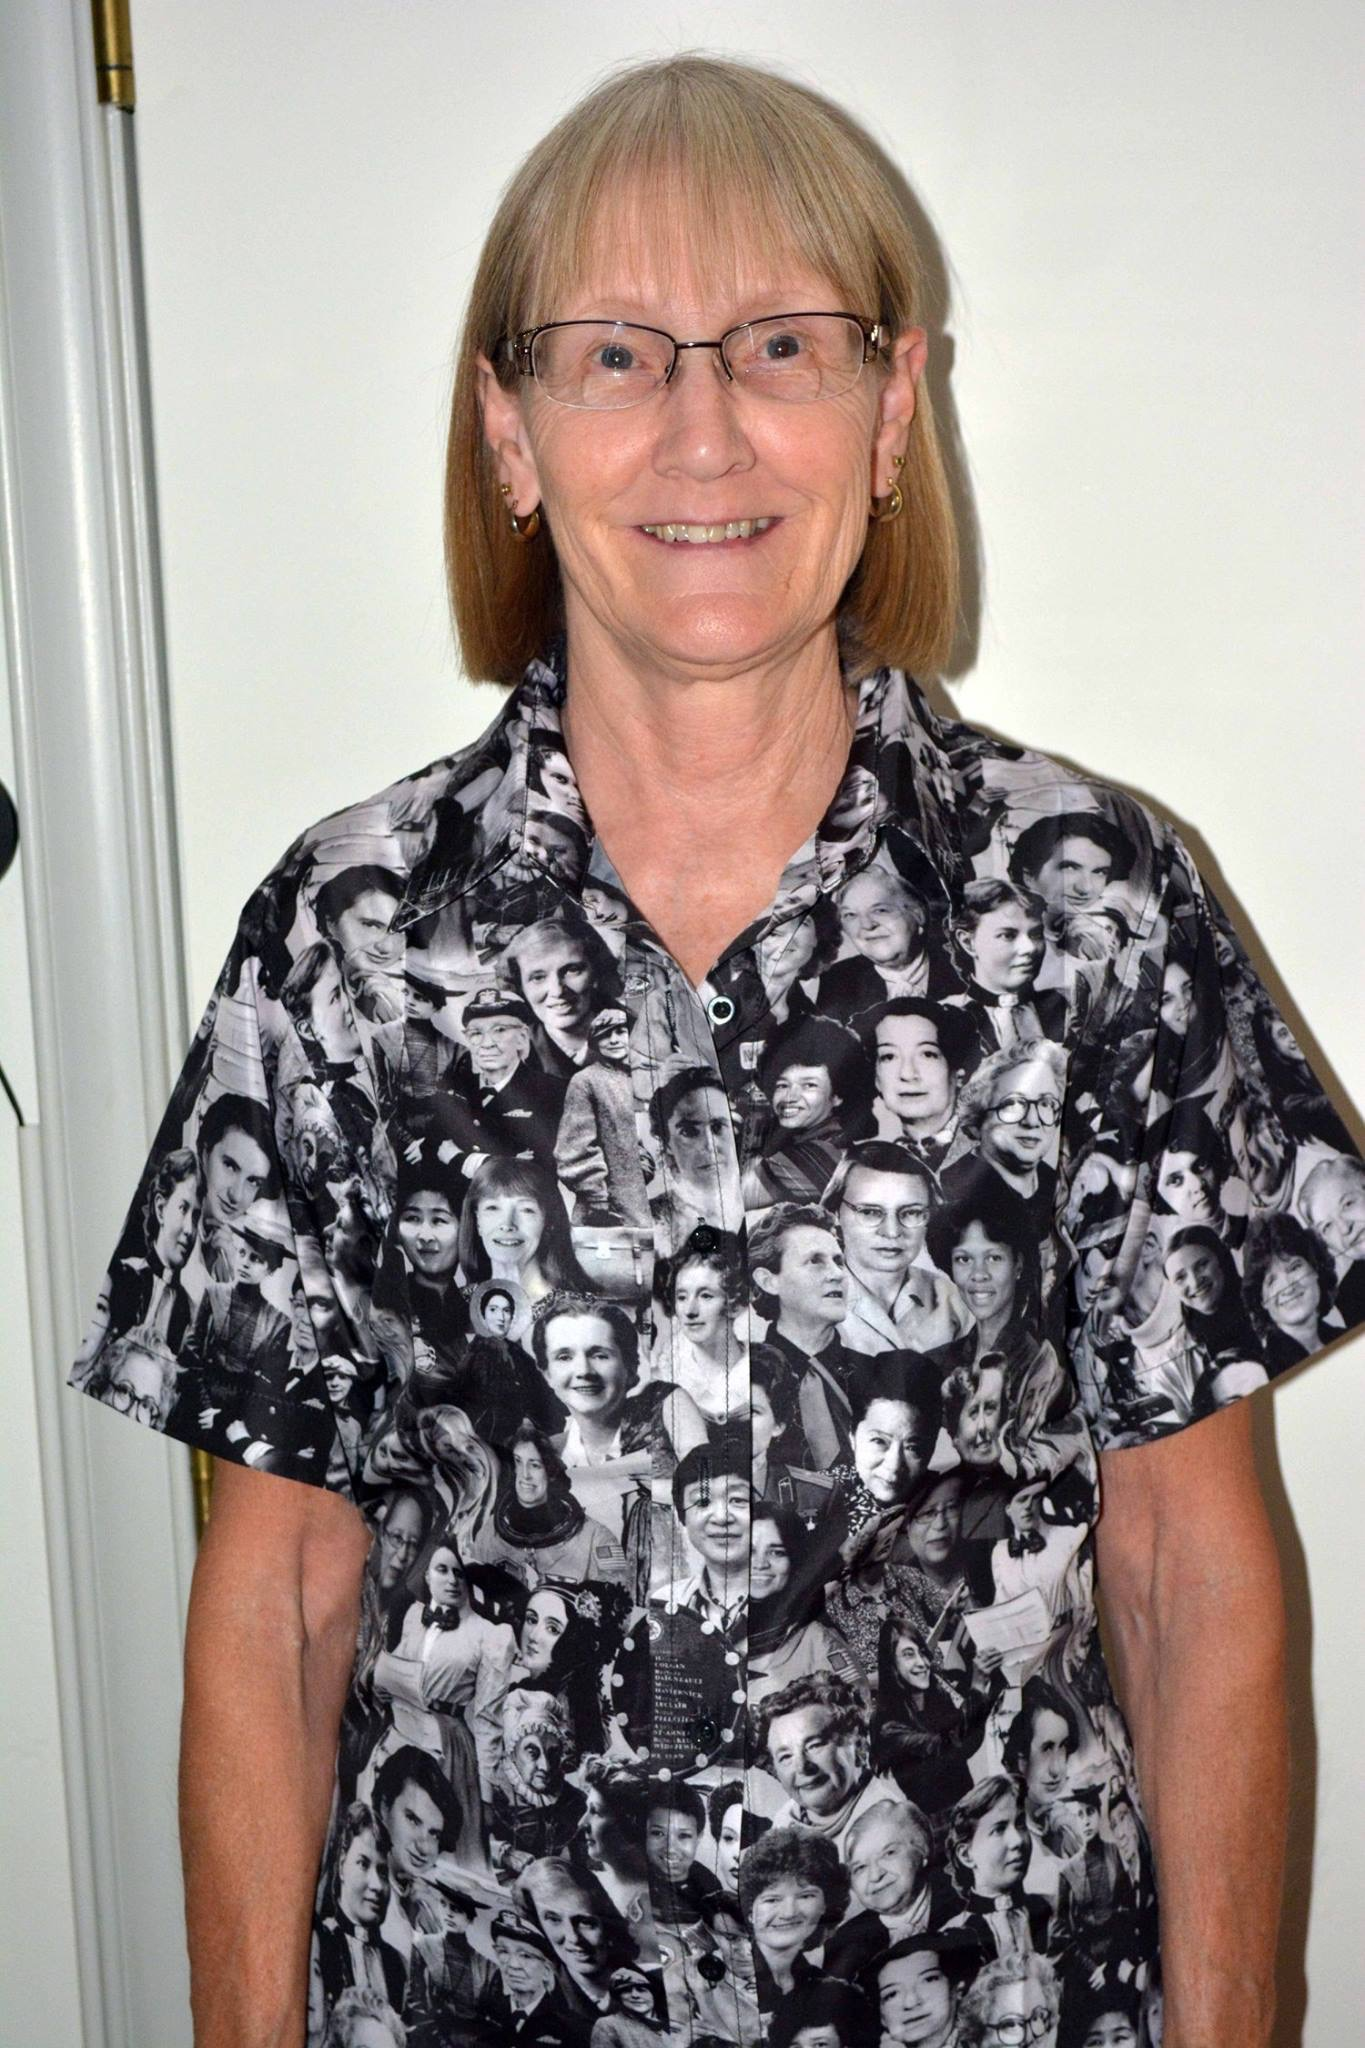 DeAnna wearing That Other Shirt